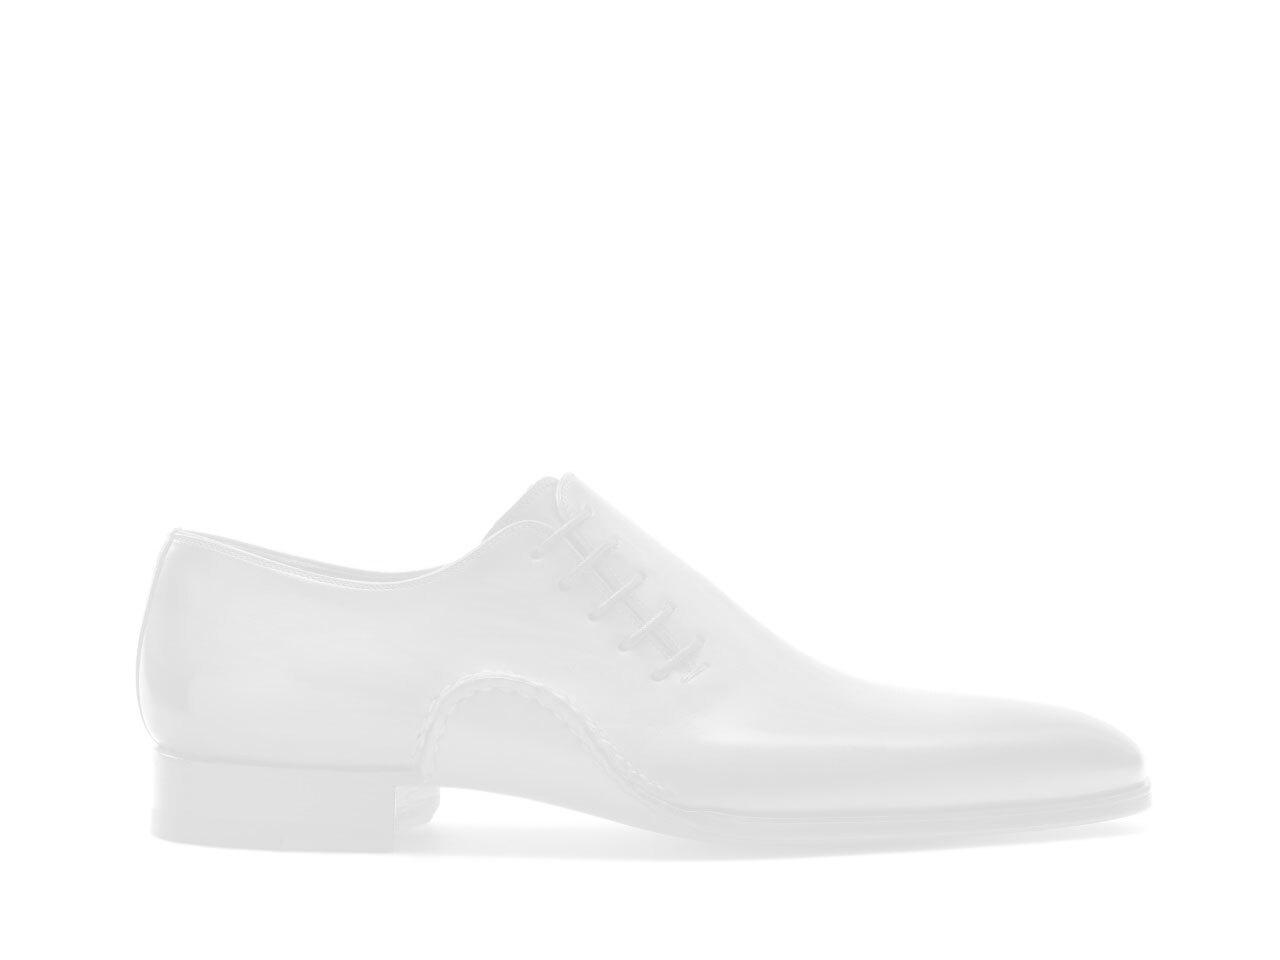 Side view of the Magnanni Cruz Black Men's Oxford Shoes